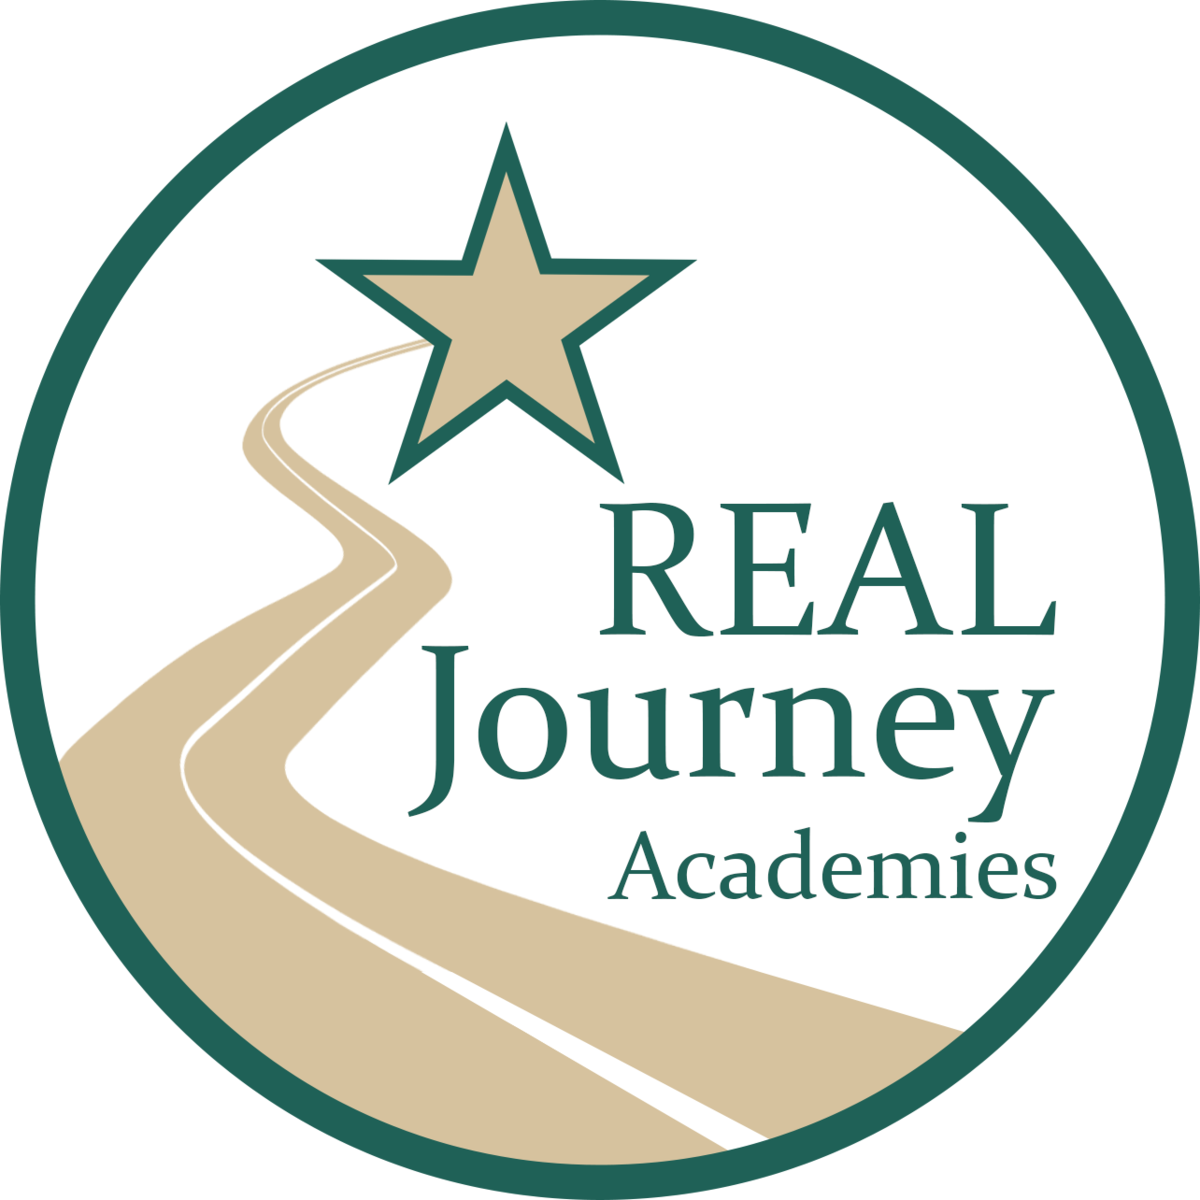 REAL Journey Academies